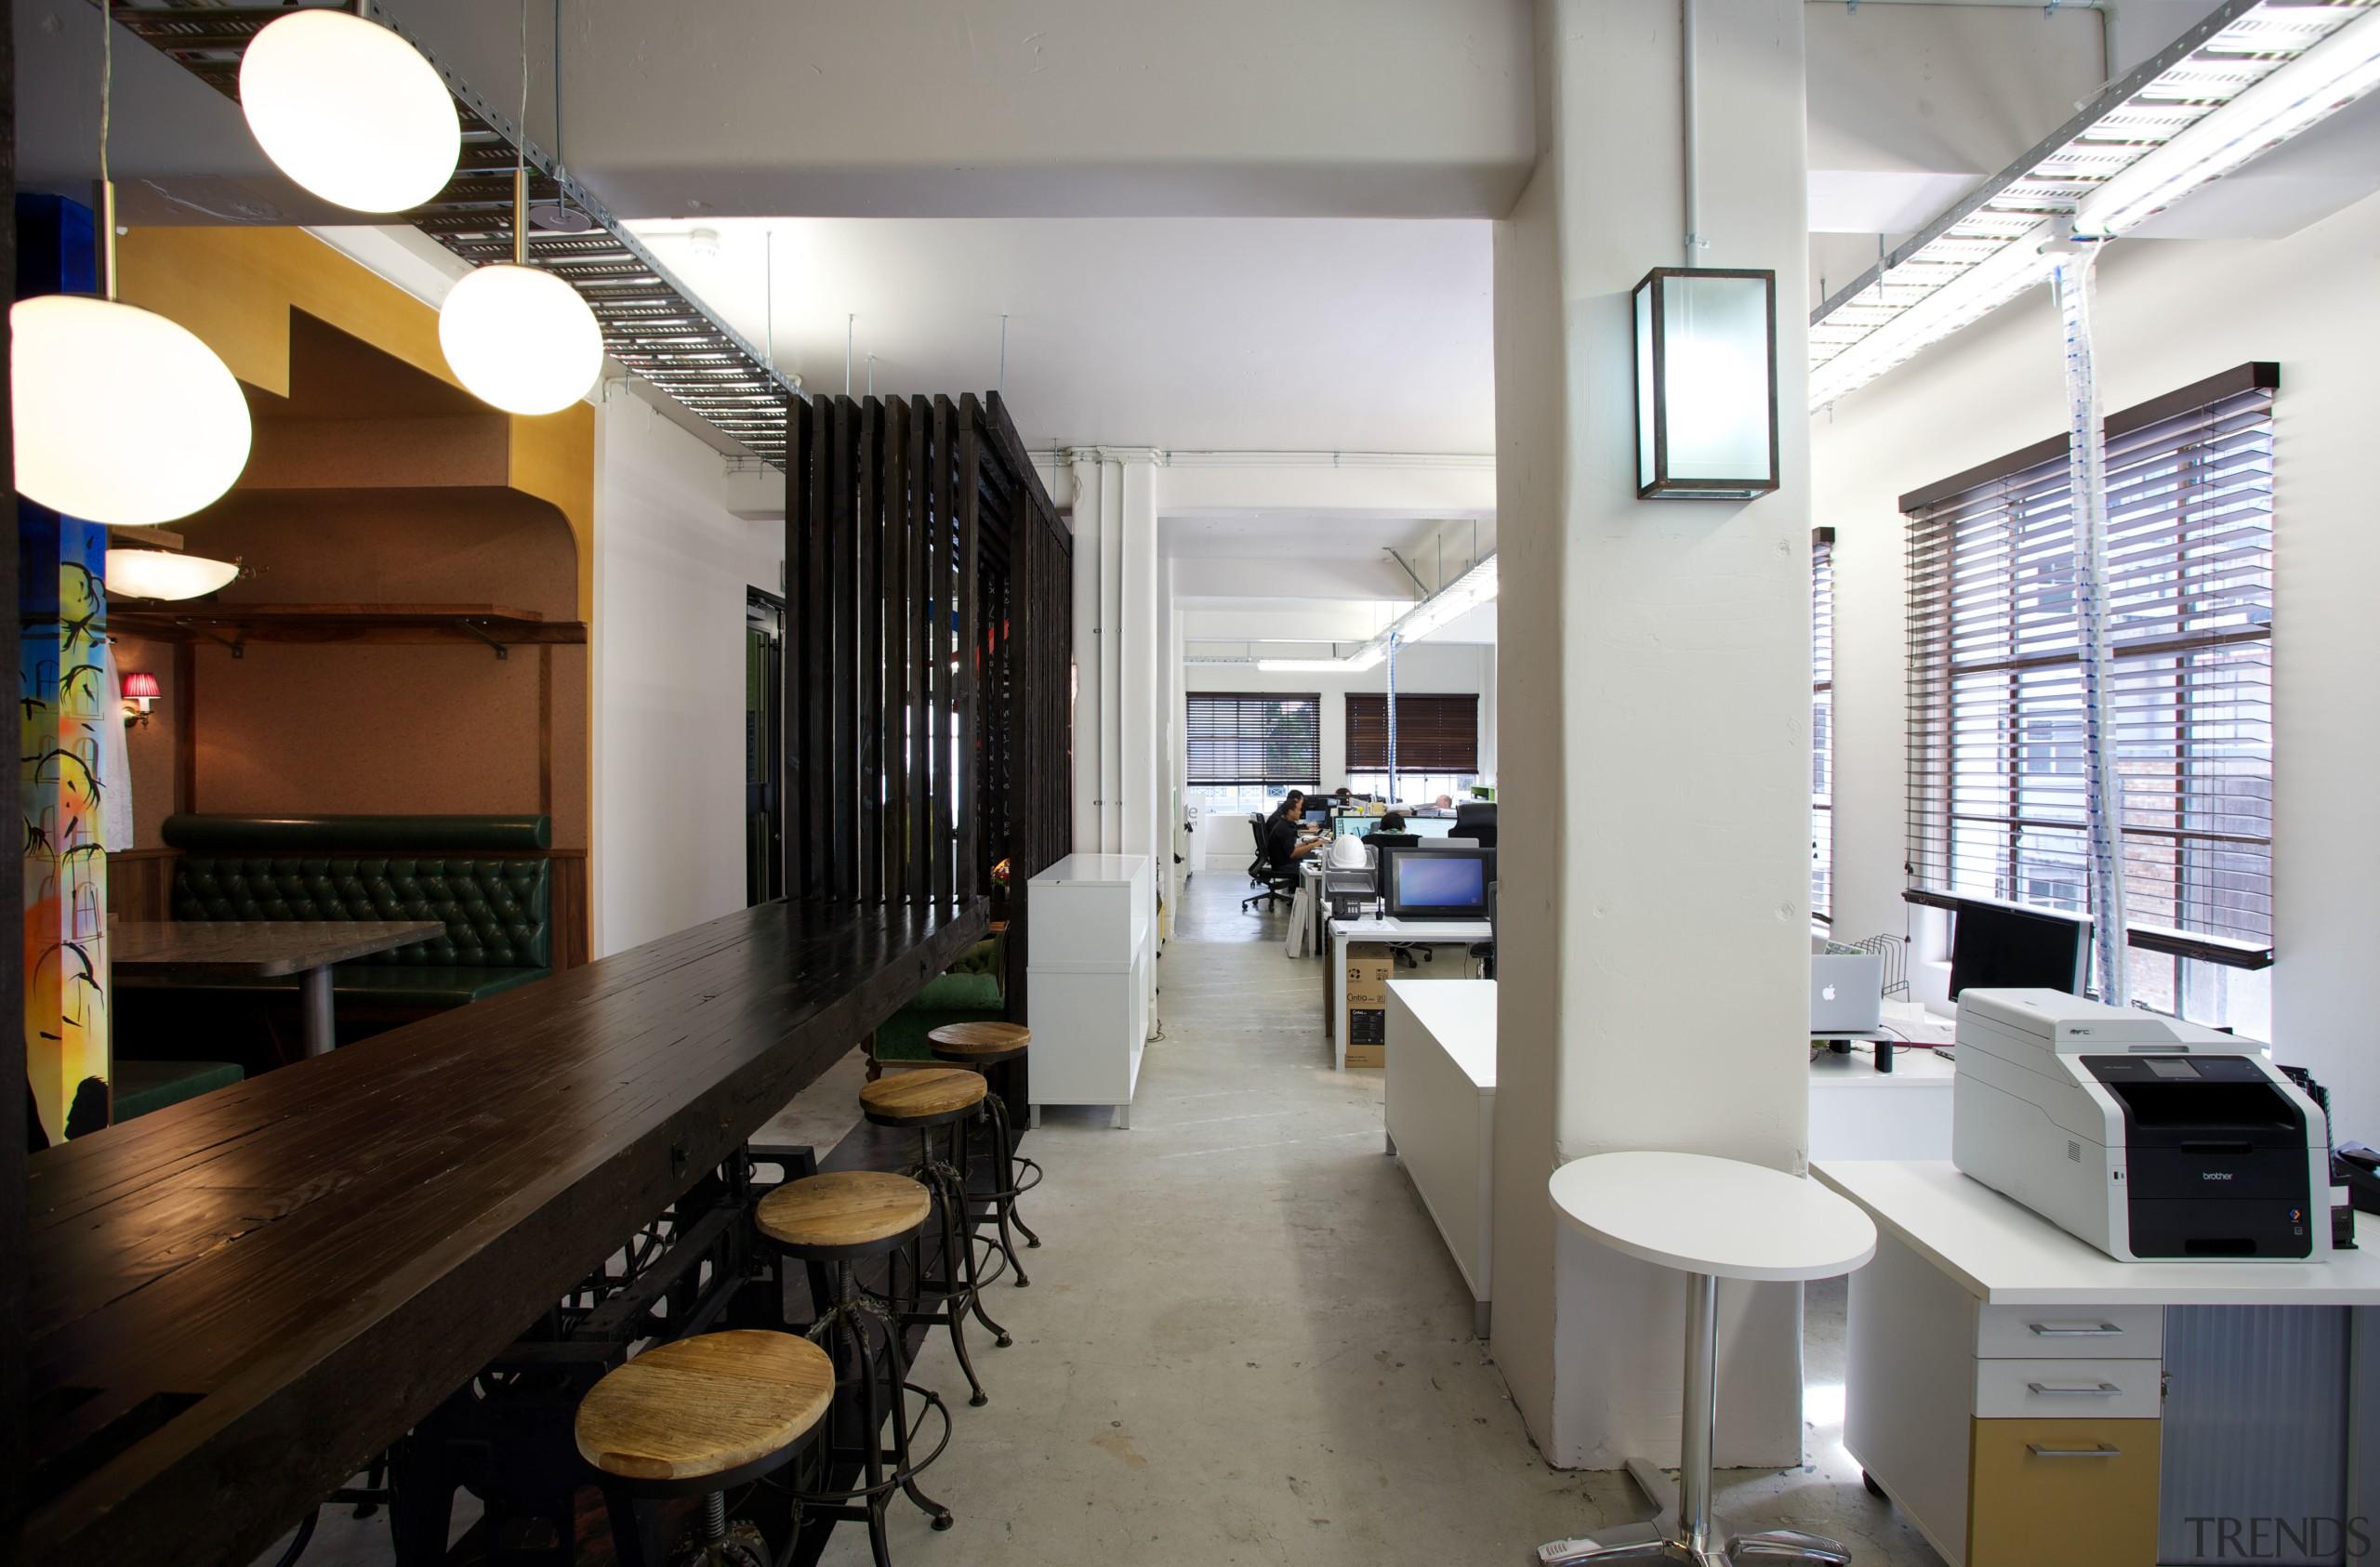 Vintage furniture in the Gaze office and design interior design, gray, white